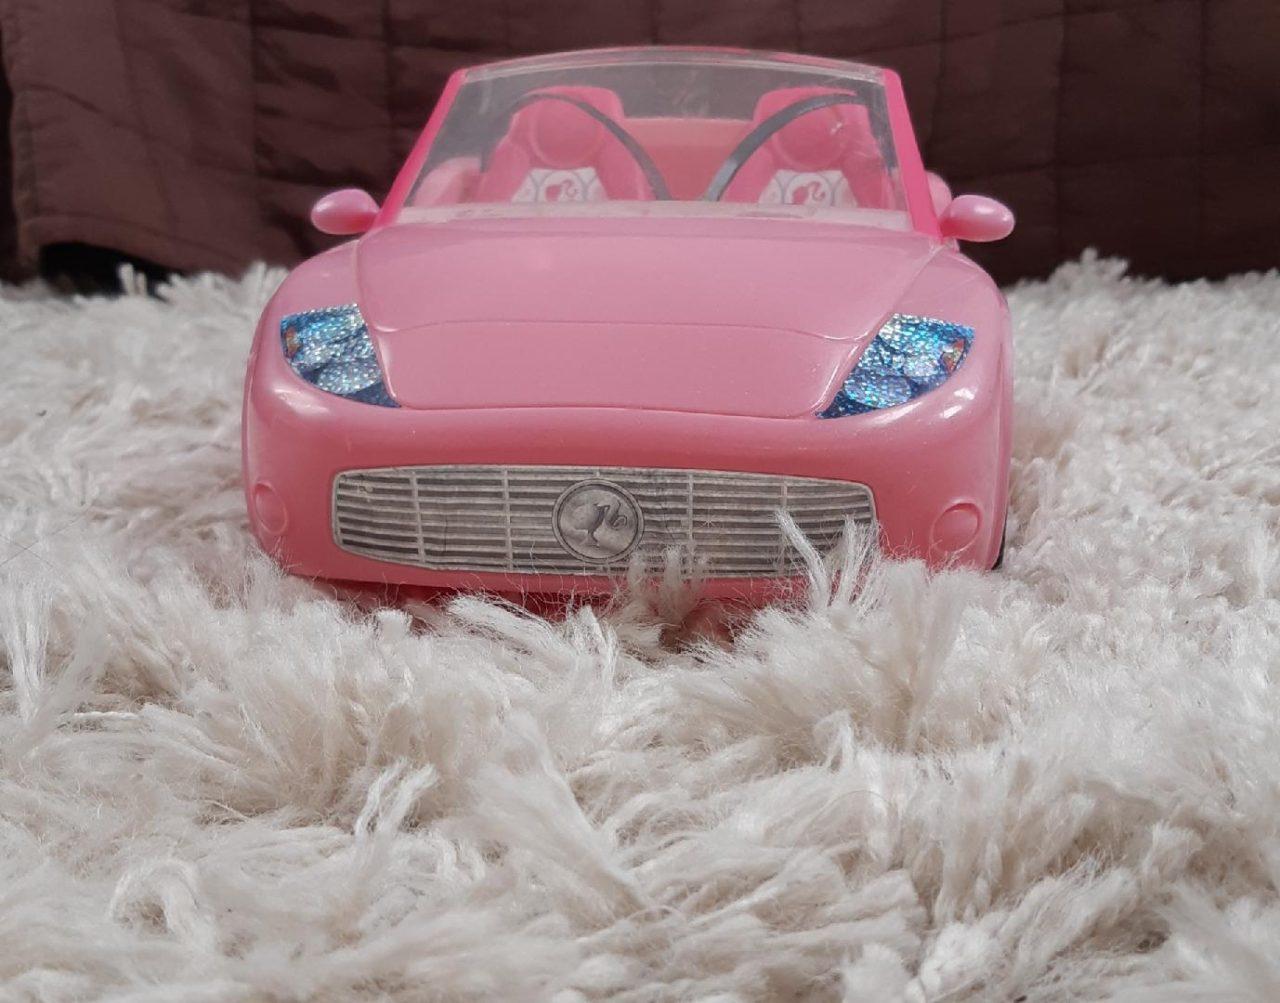 A Pink Barbie Convertible Car On A White Carpet